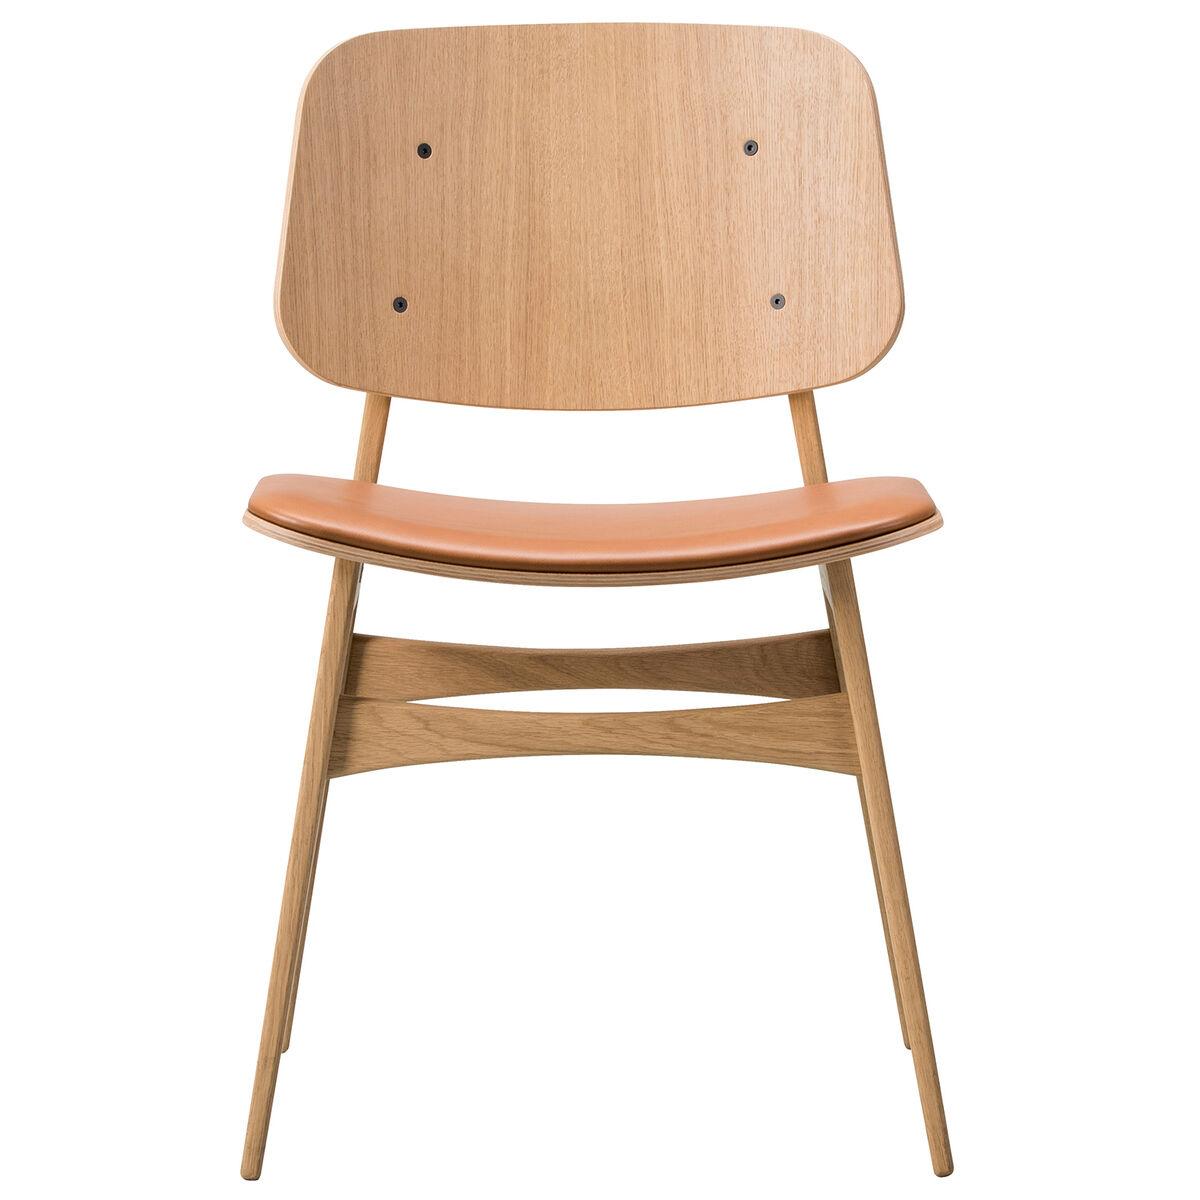 Fredericia S�borg tuoli 3051, puurunko, lakattu tammi - ruskea nahka